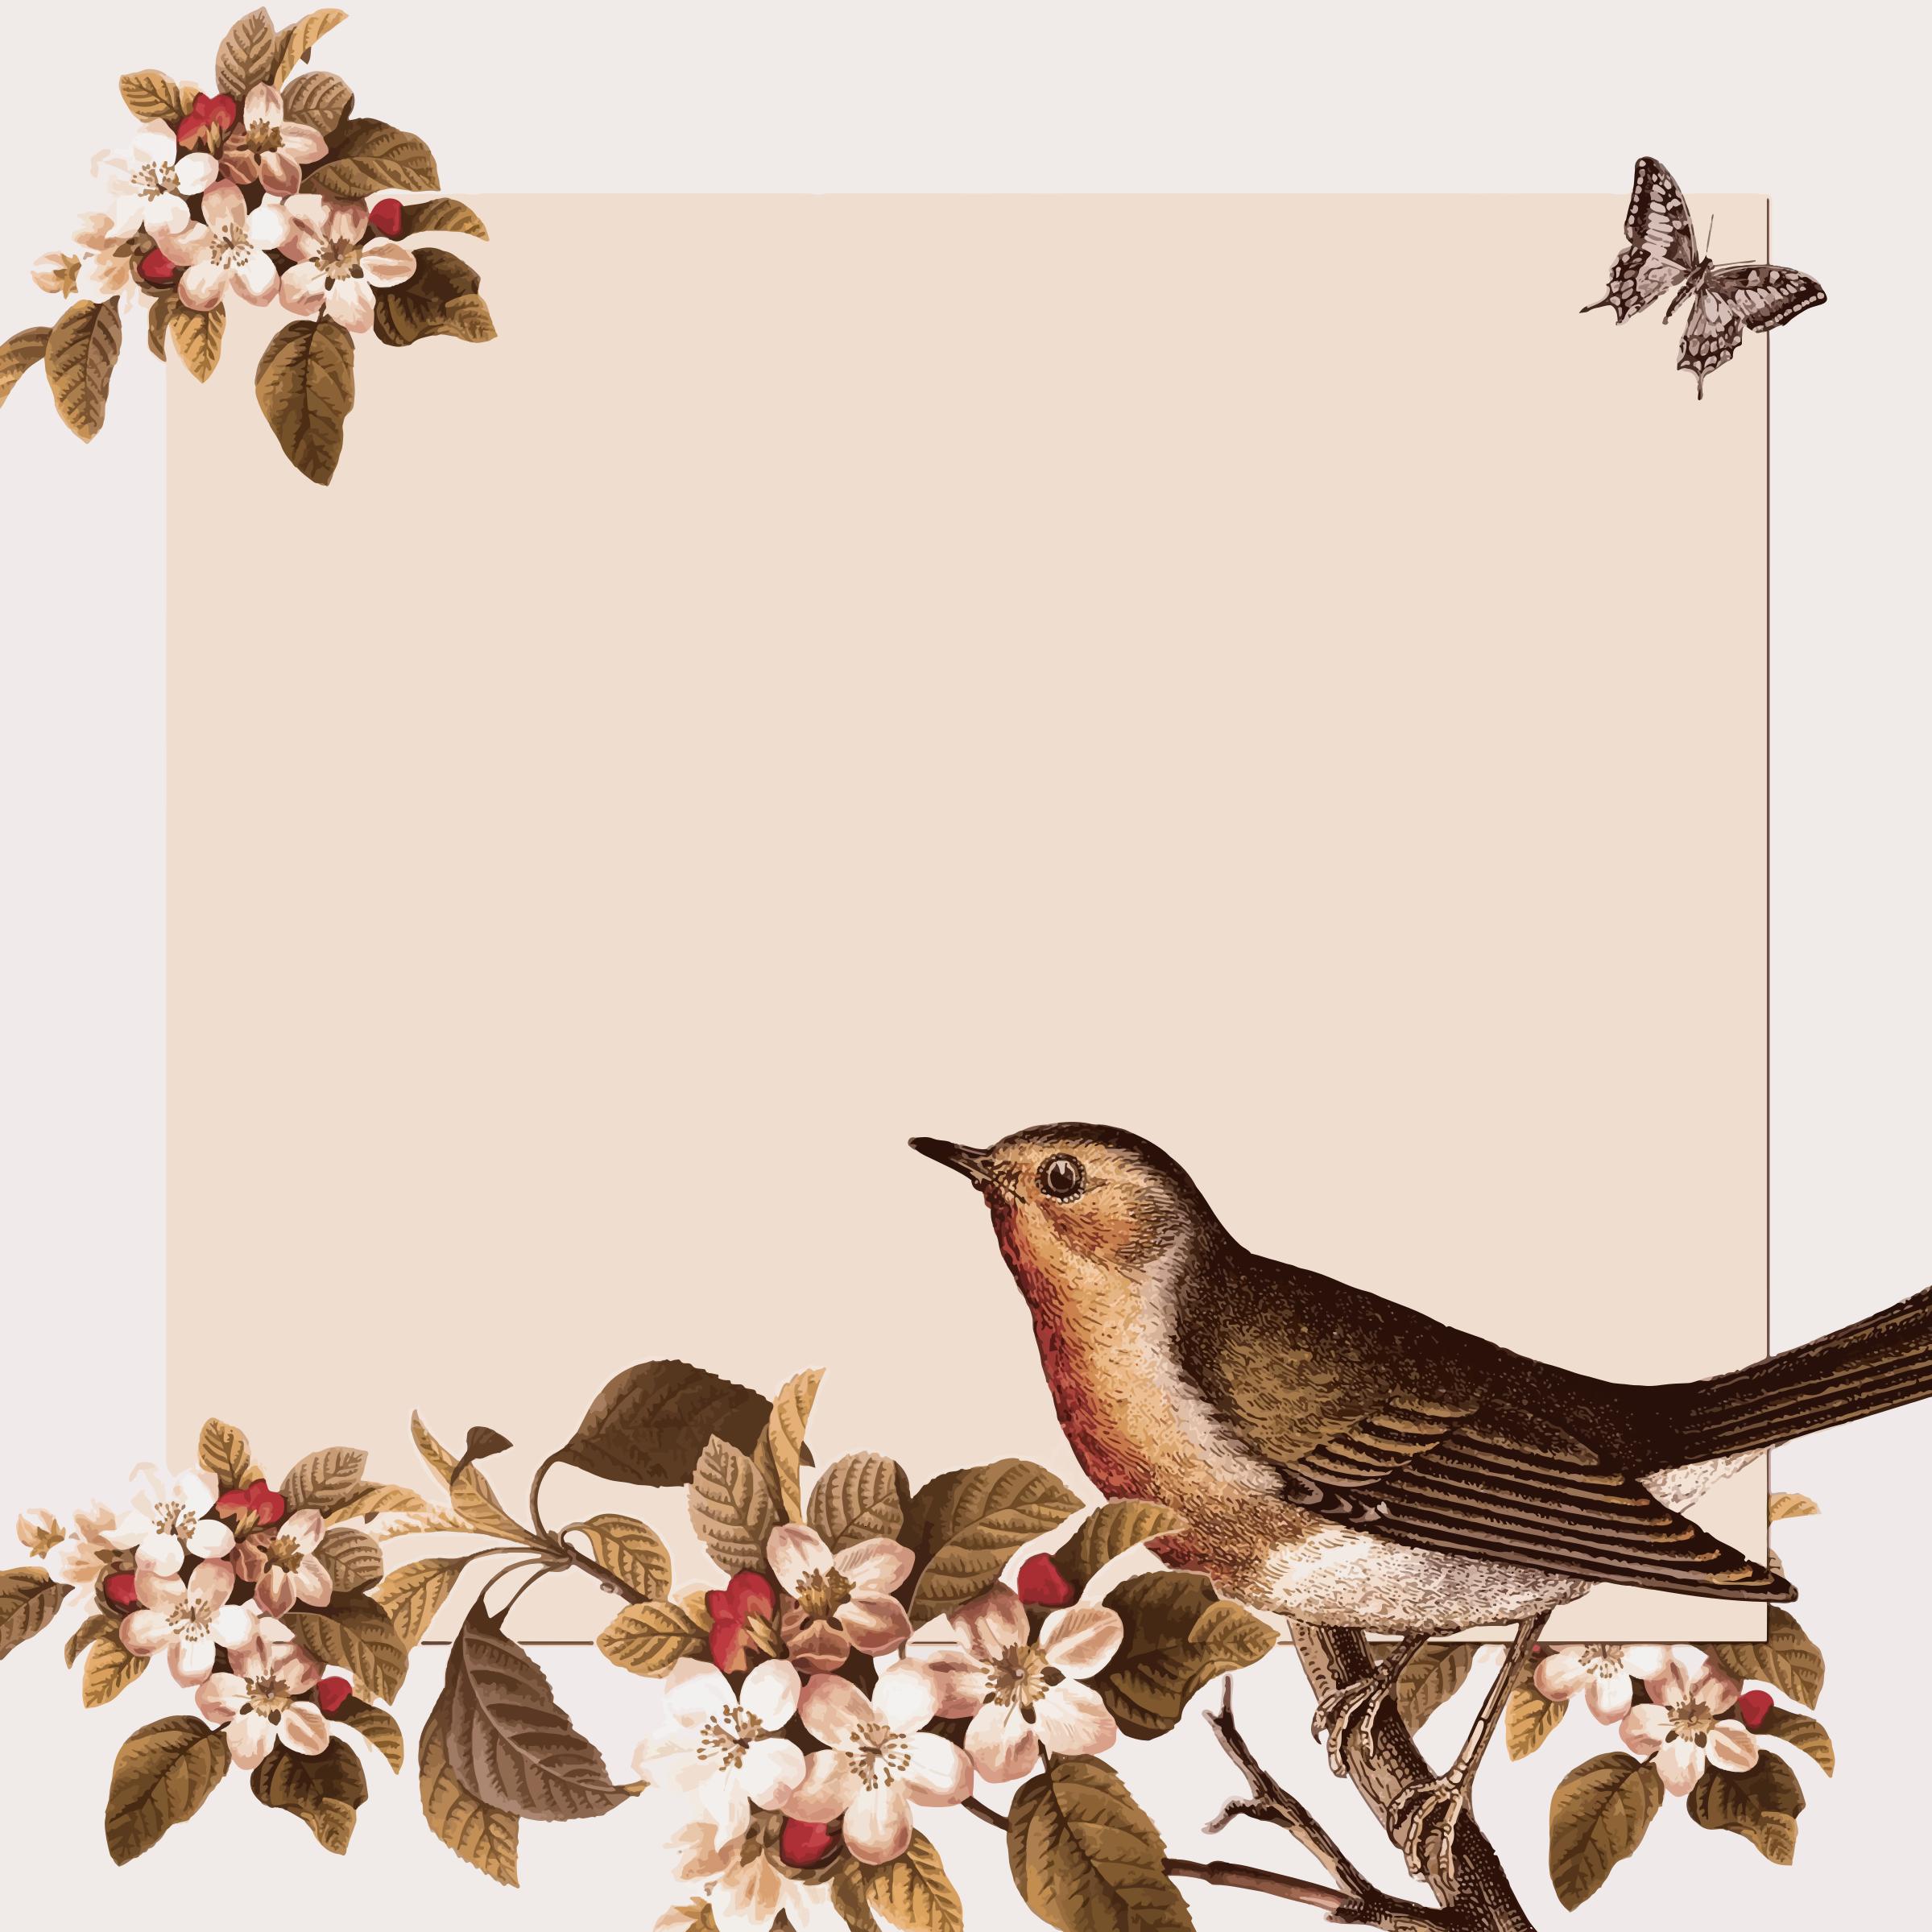 Background clipart vintage. Bird and floral big